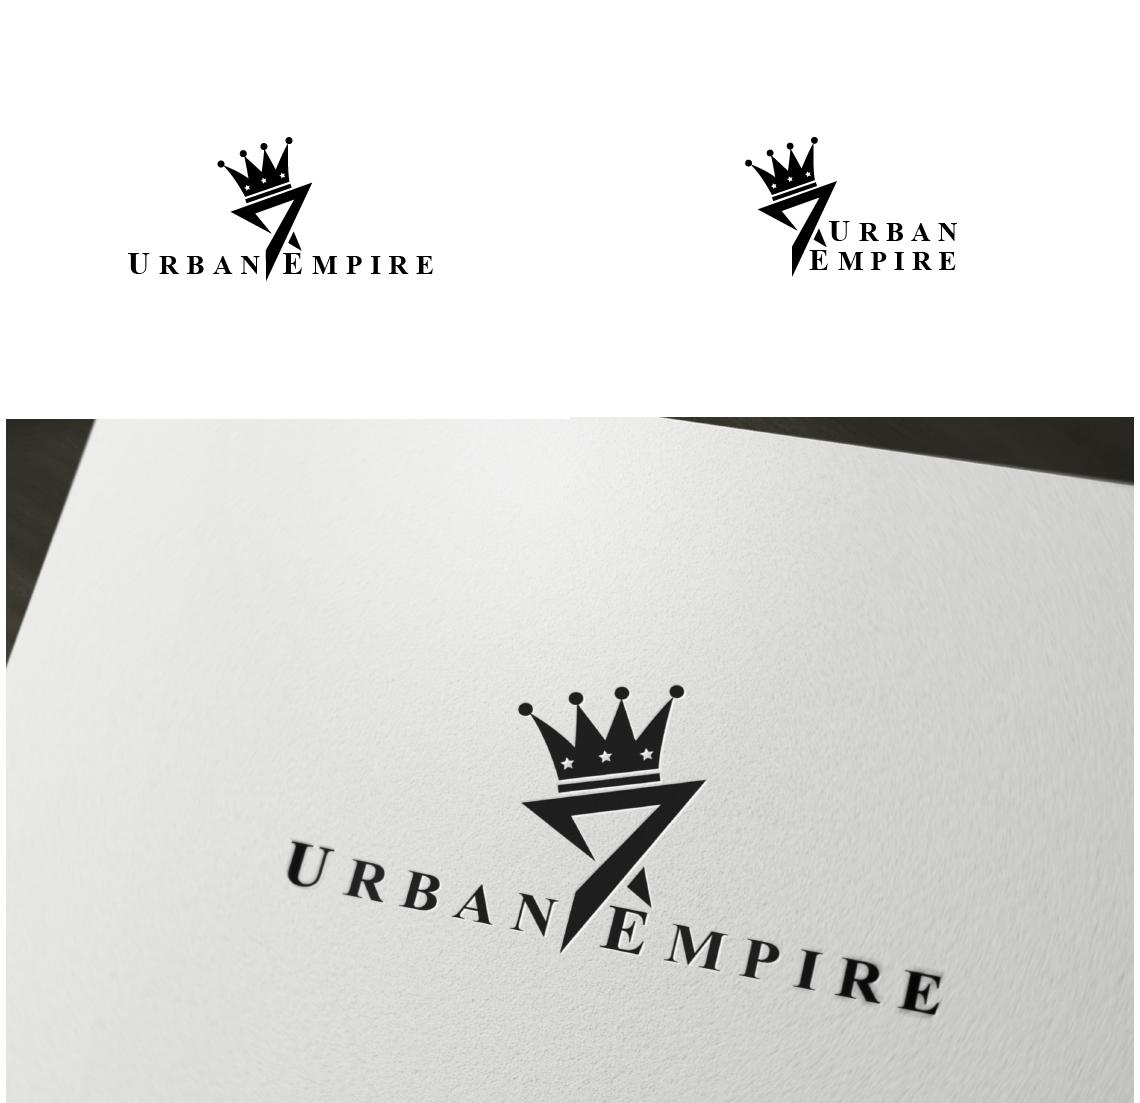 Clothing Logo Design for URBAN EMPIRE by Warliz Design ...  Clothing Logo D...